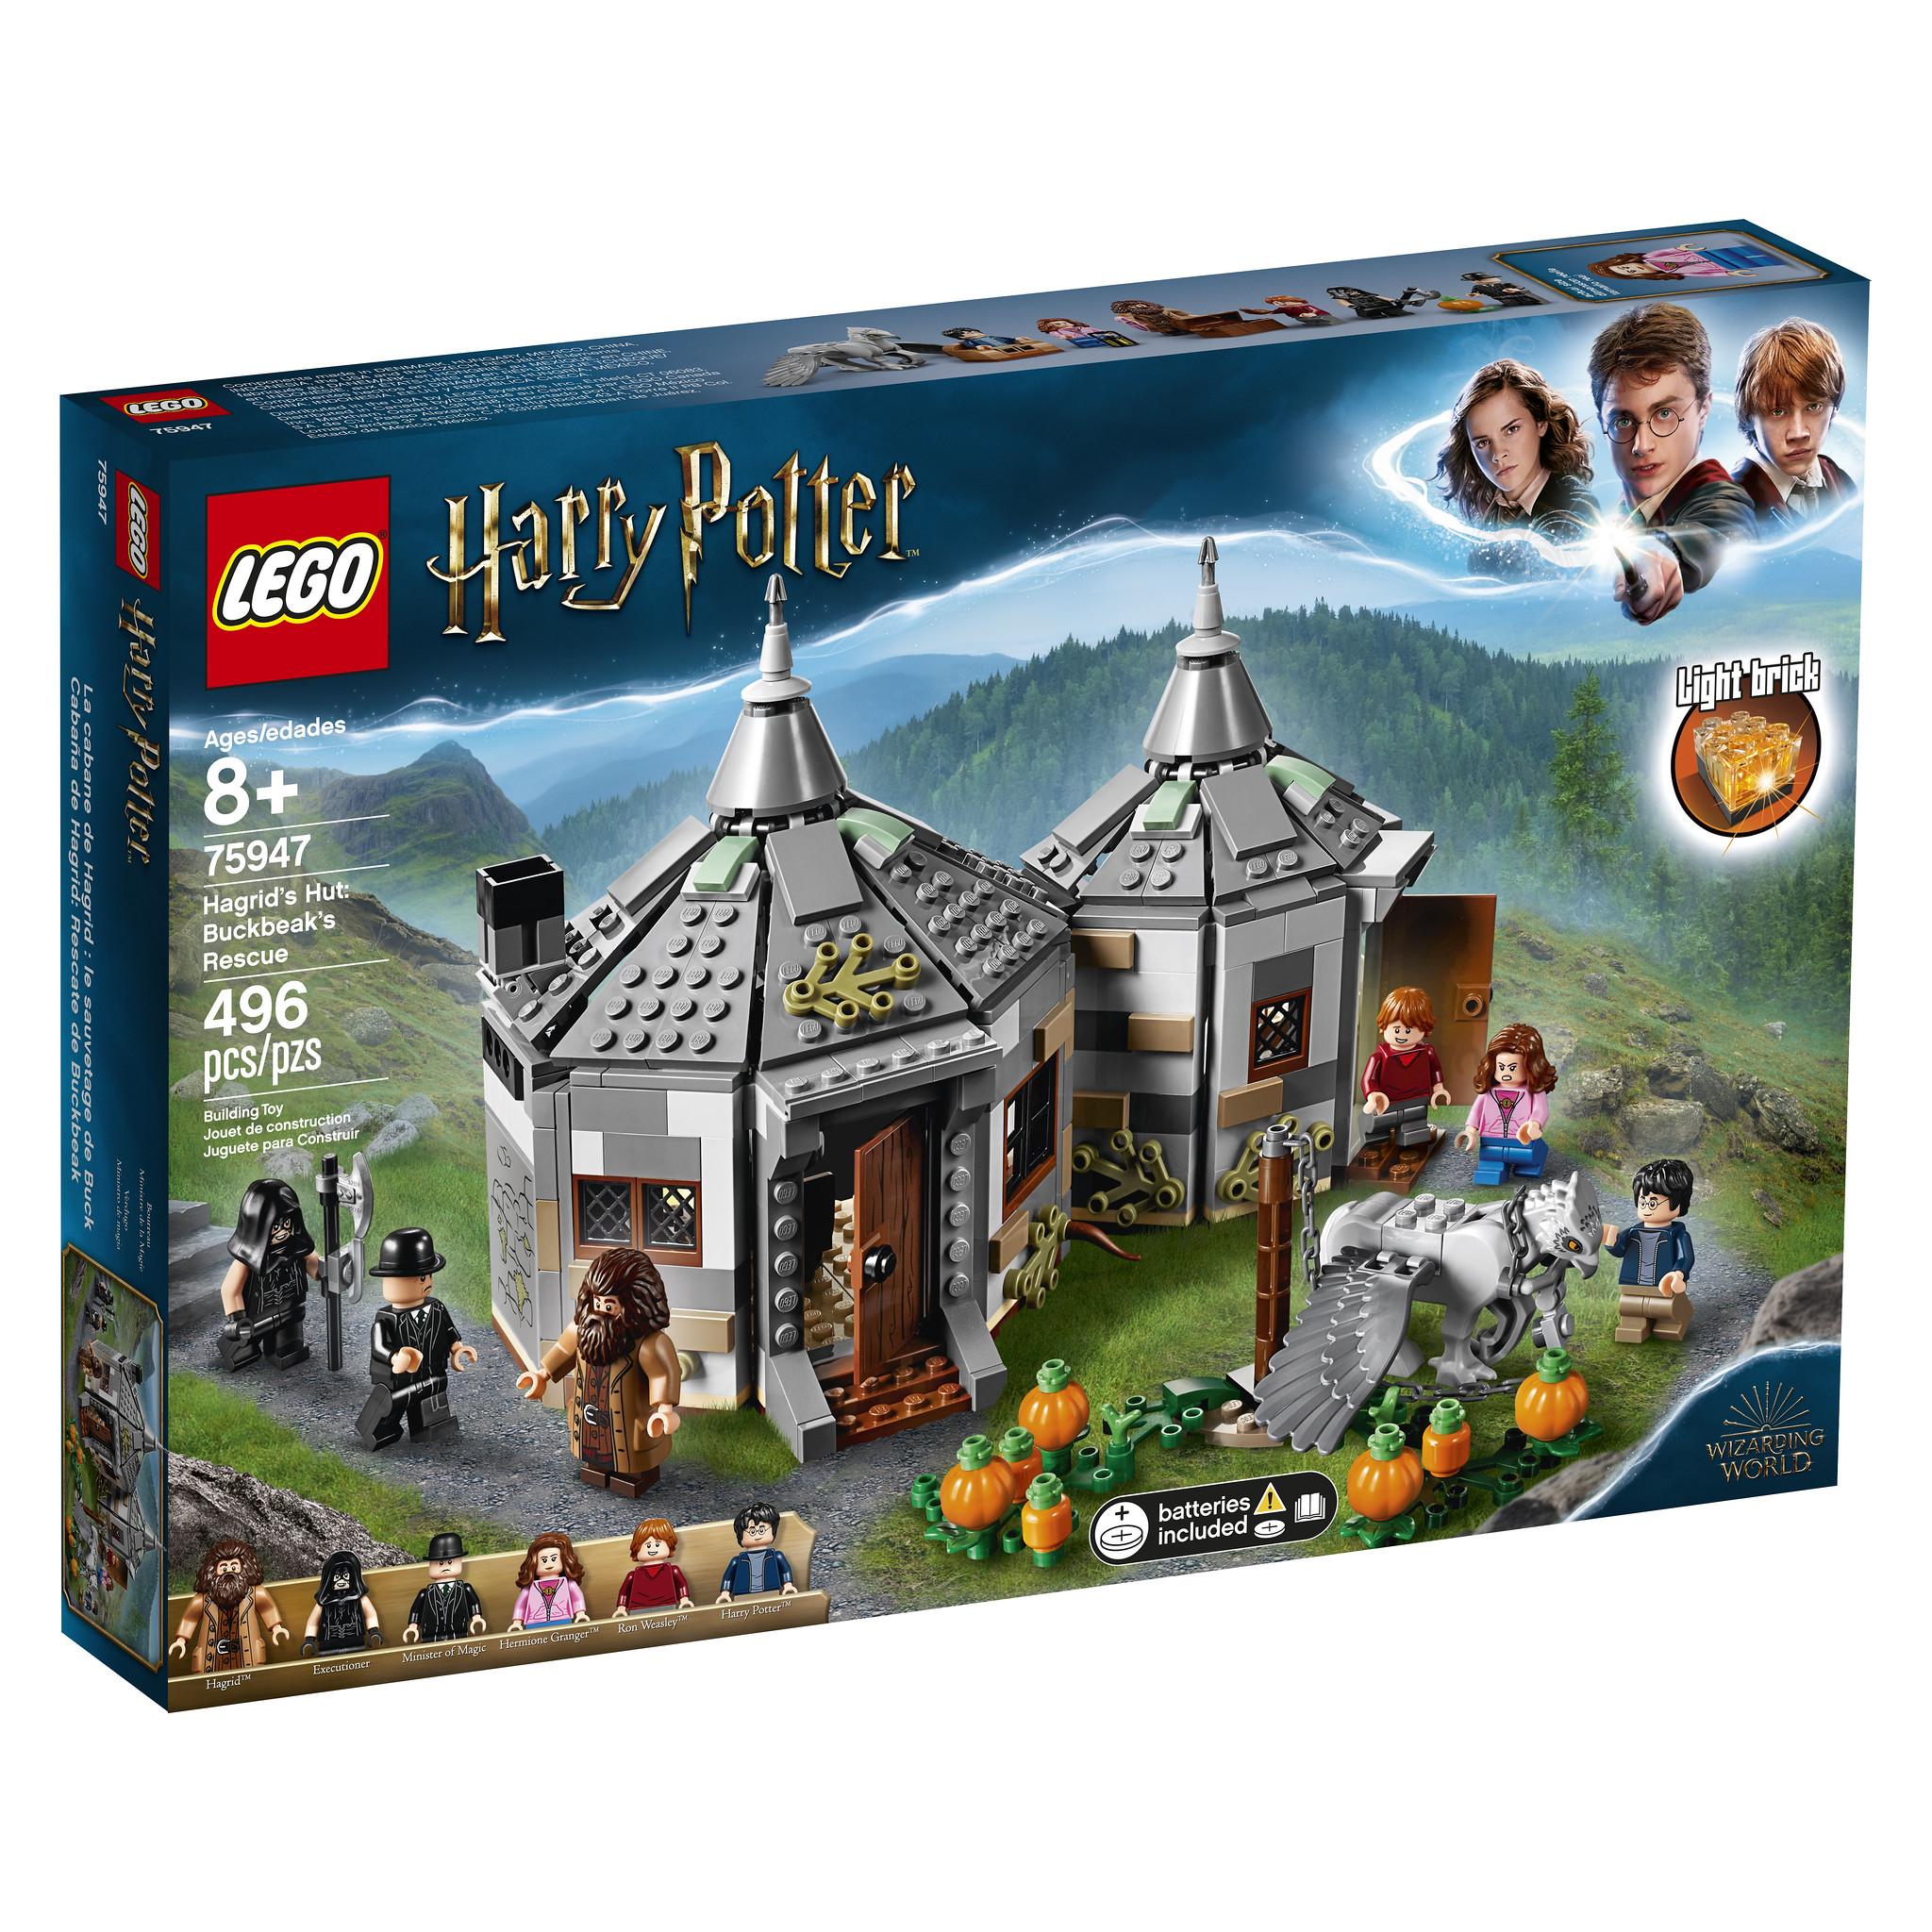 LEGO HARRY POTTER Minifigur RUBEUS HAGRID aus Set 75954